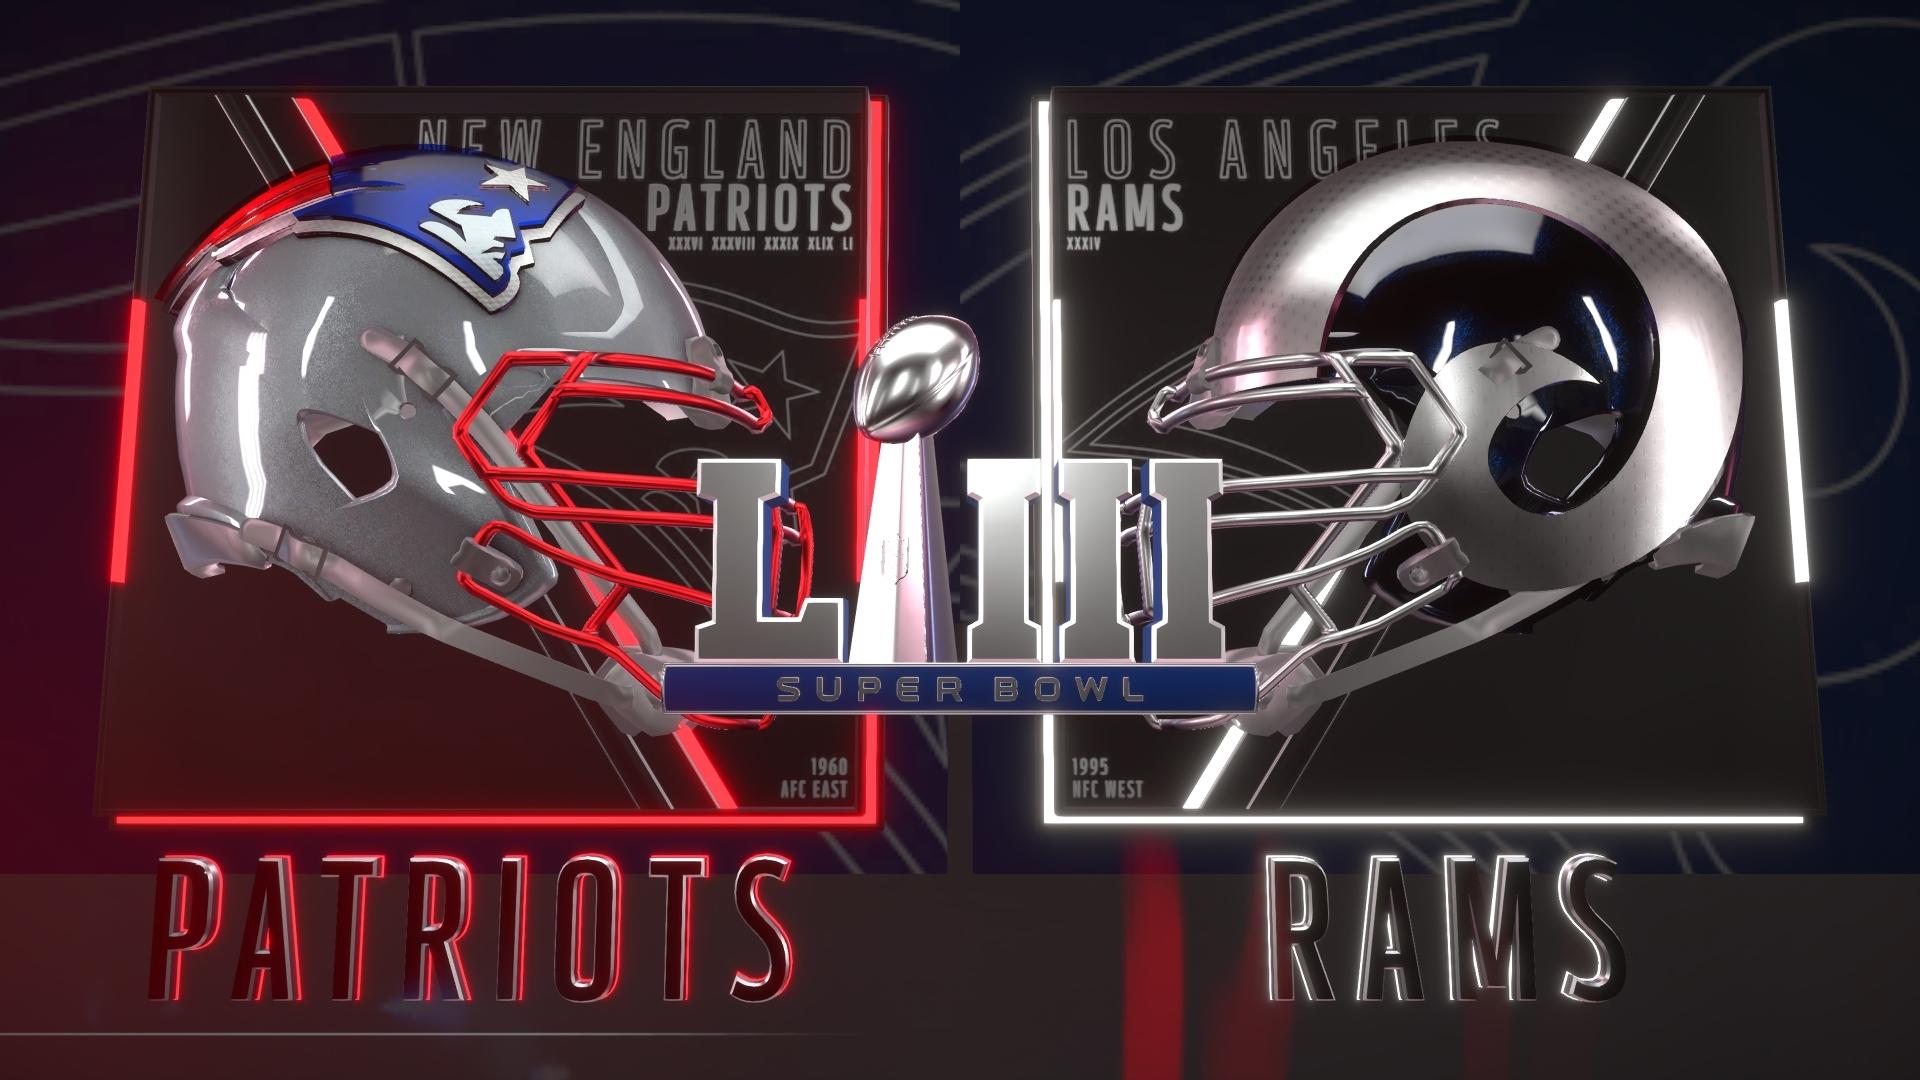 Der Super Sunday Steht Vor Der Tür! - Super Bowl Preview Von intended for Pats Rams Super Bowl